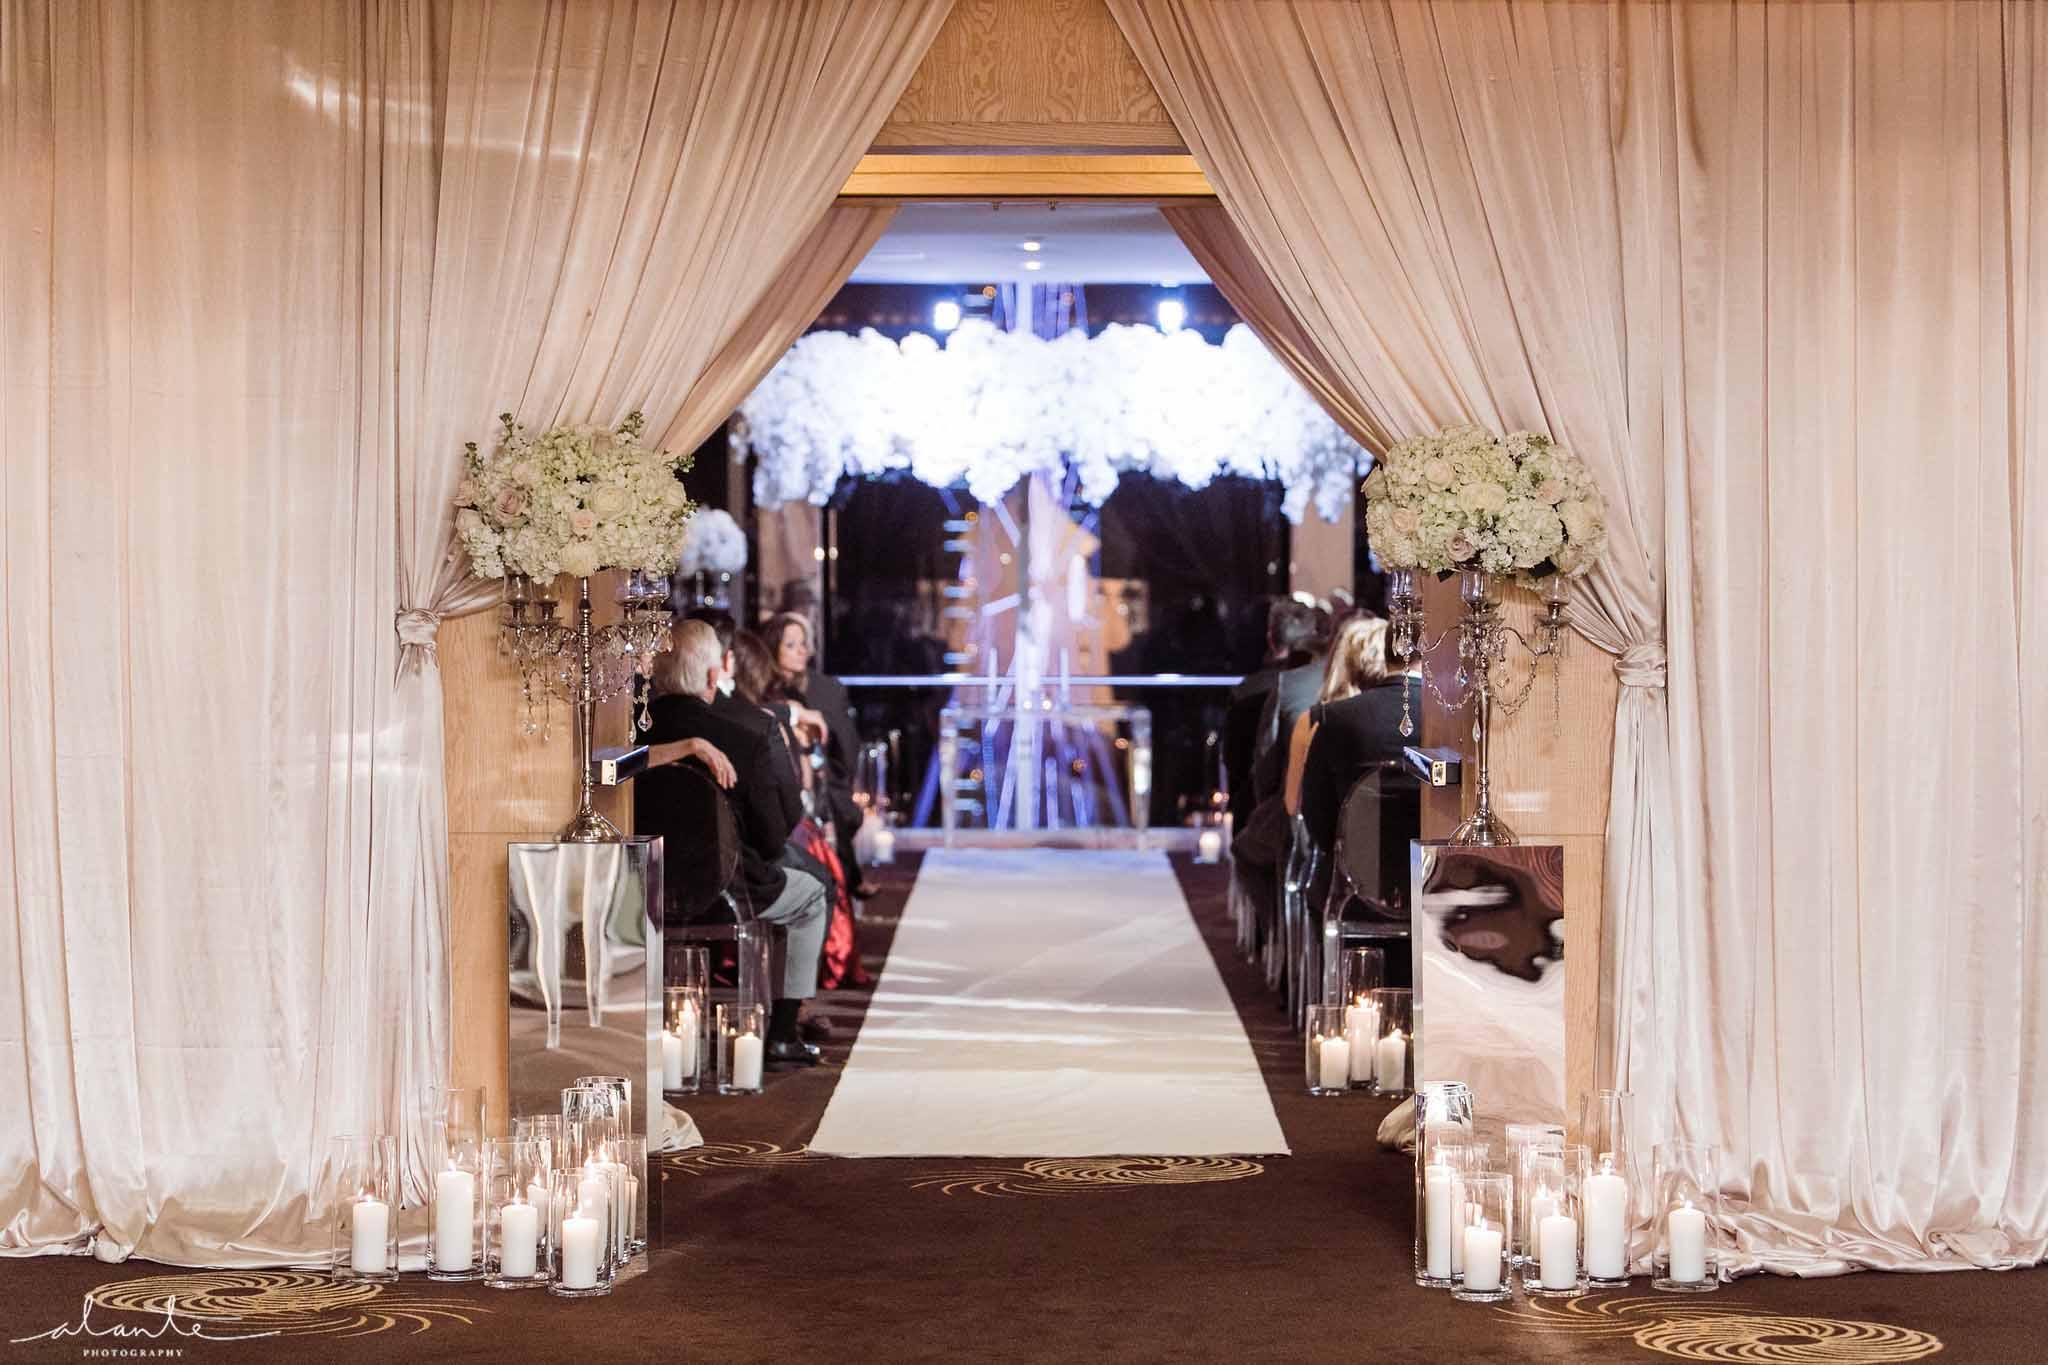 Glamorous wedding aisle - Luxury Winter Wedding at the Four Seasons by Flora Nova Design Seattle